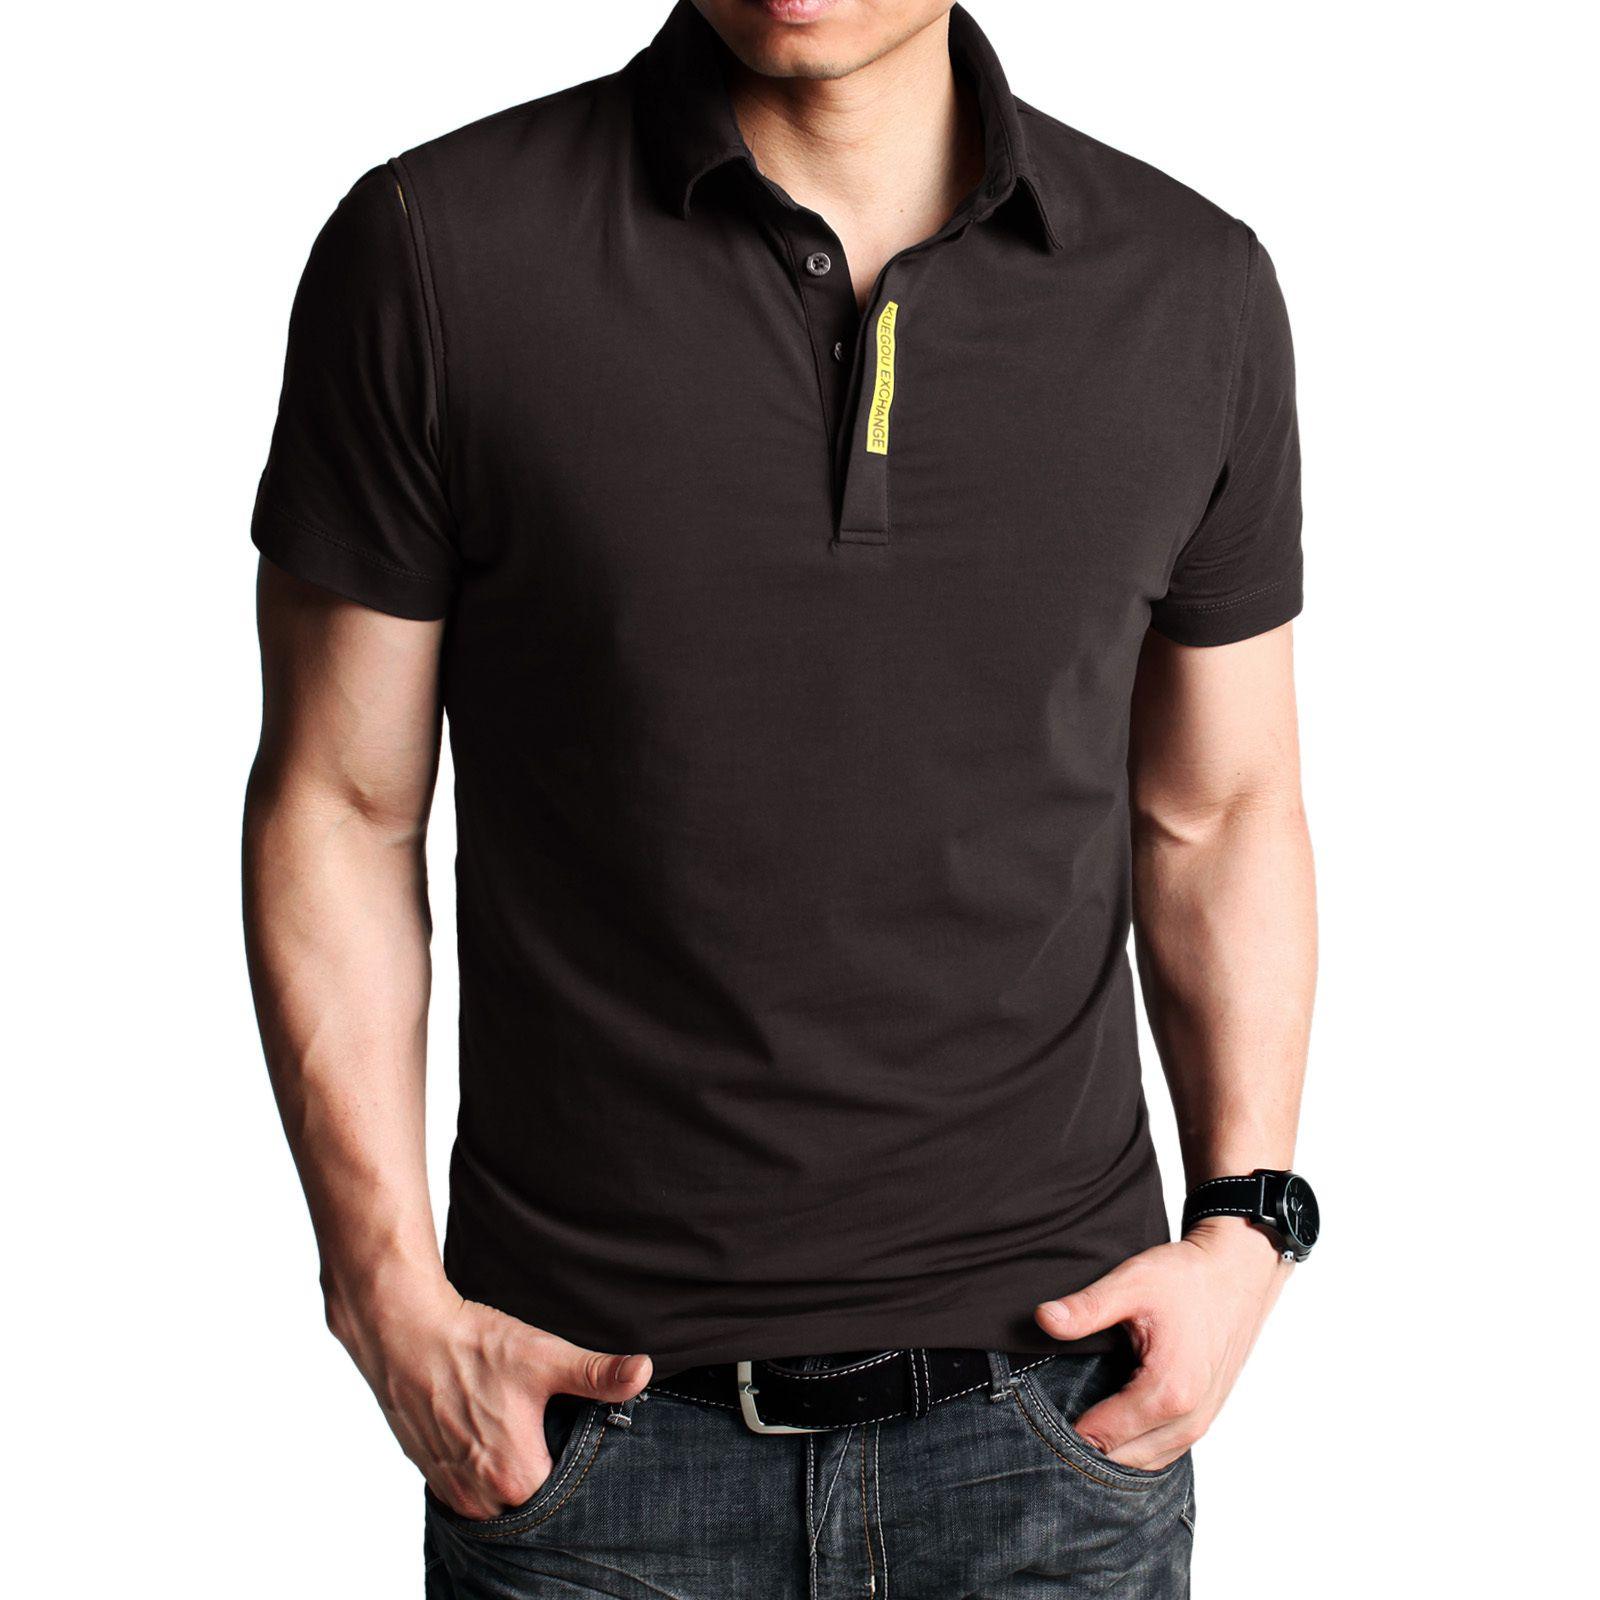 4d650fe4fd5f Kuegou Short Sleeve Polo Shirt Code  20124690 - Men s Polo Shirts - Men s  Clothing at Clothing.net